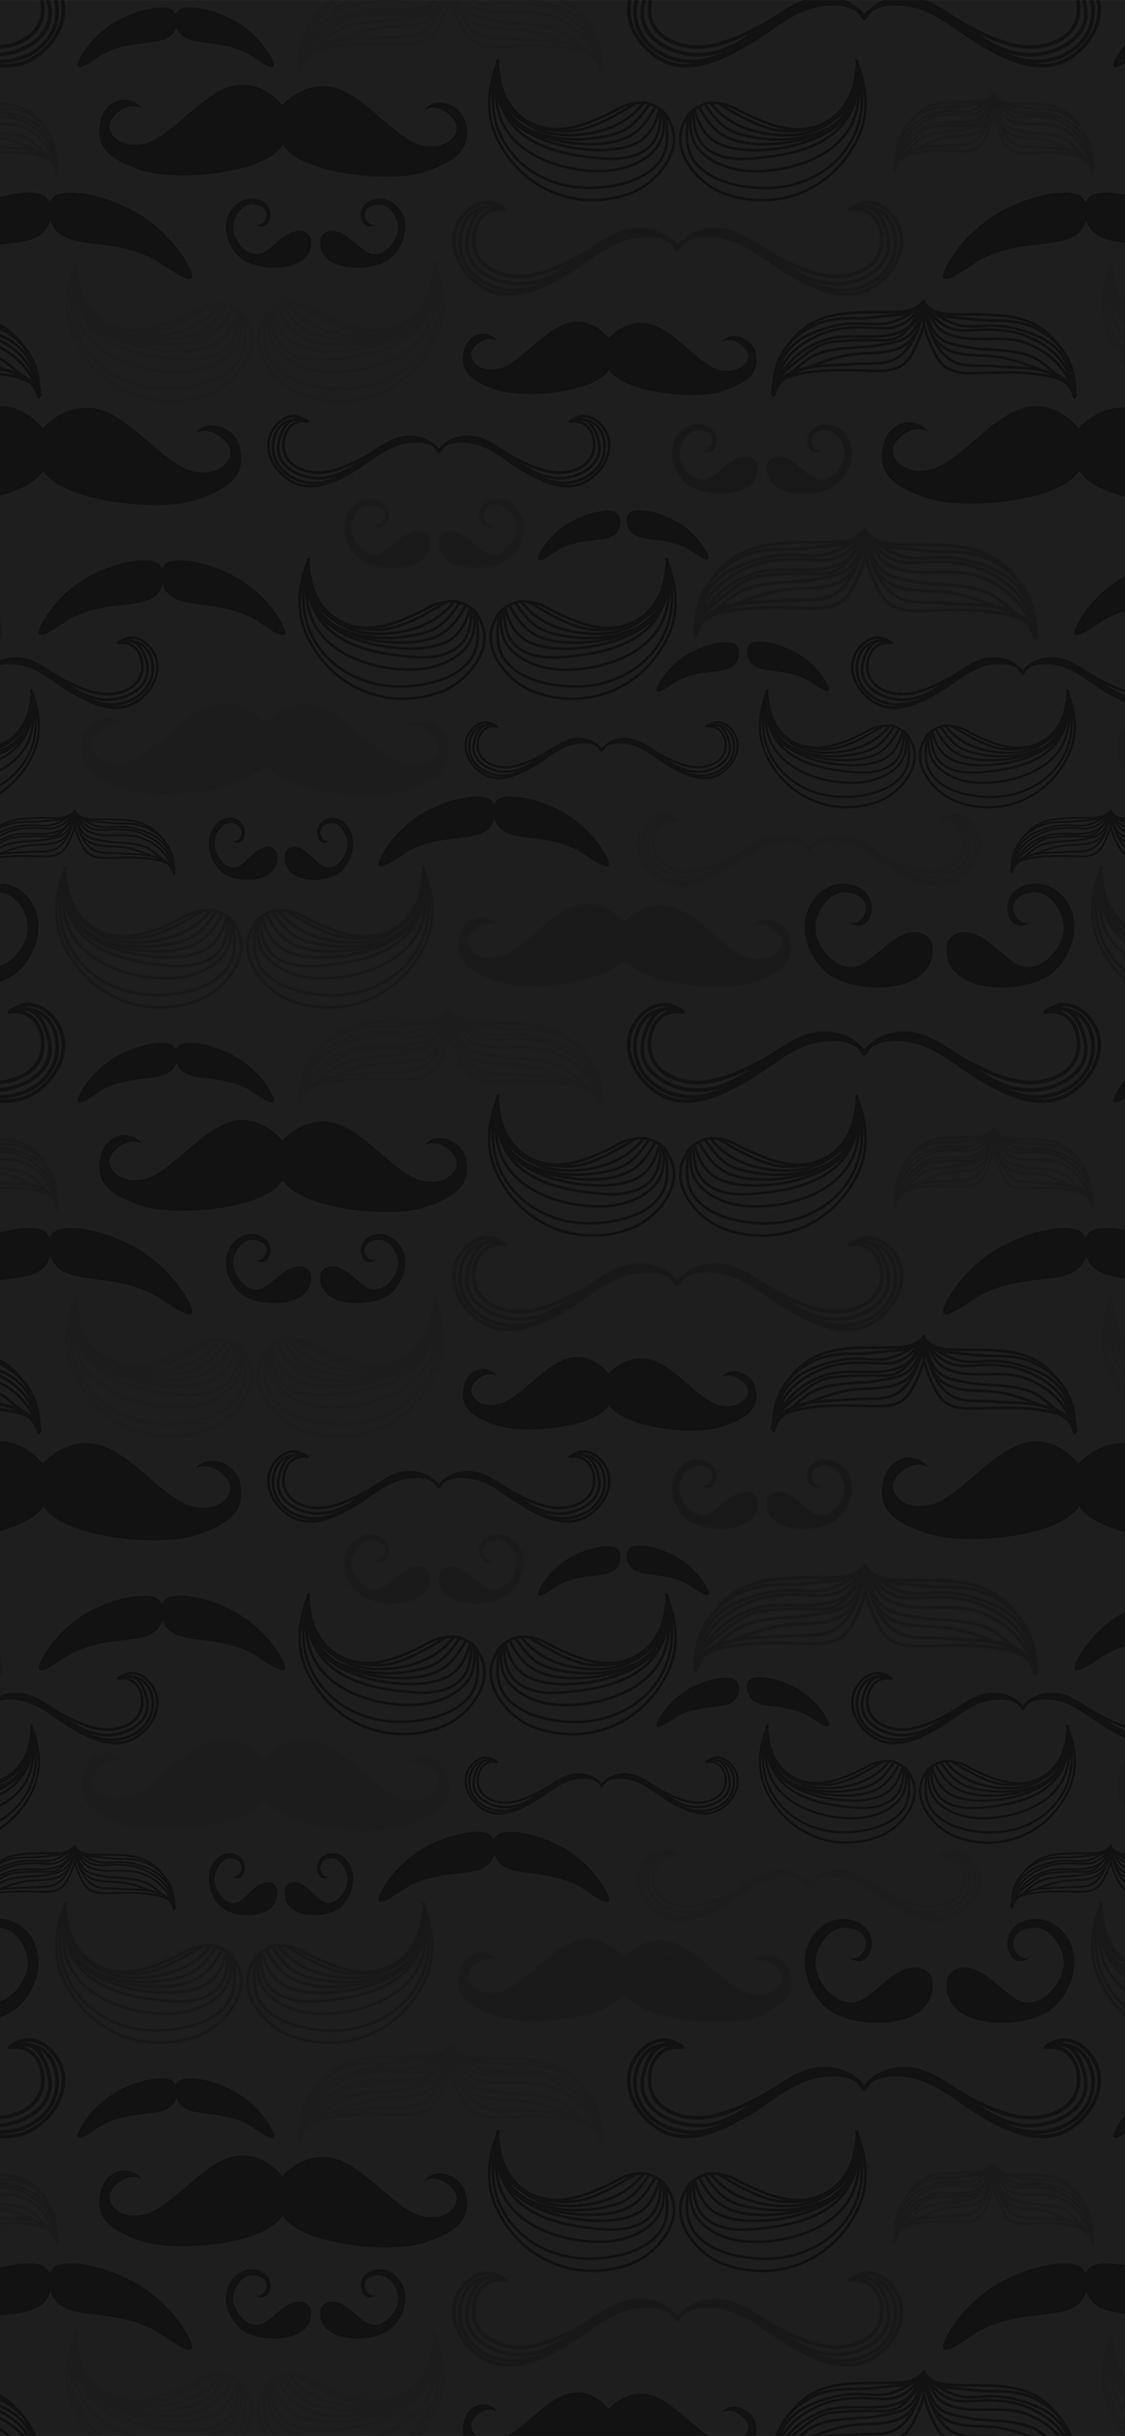 iPhoneXpapers.com-Apple-iPhone-wallpaper-ve72-hipster-moustache-cute-patterns